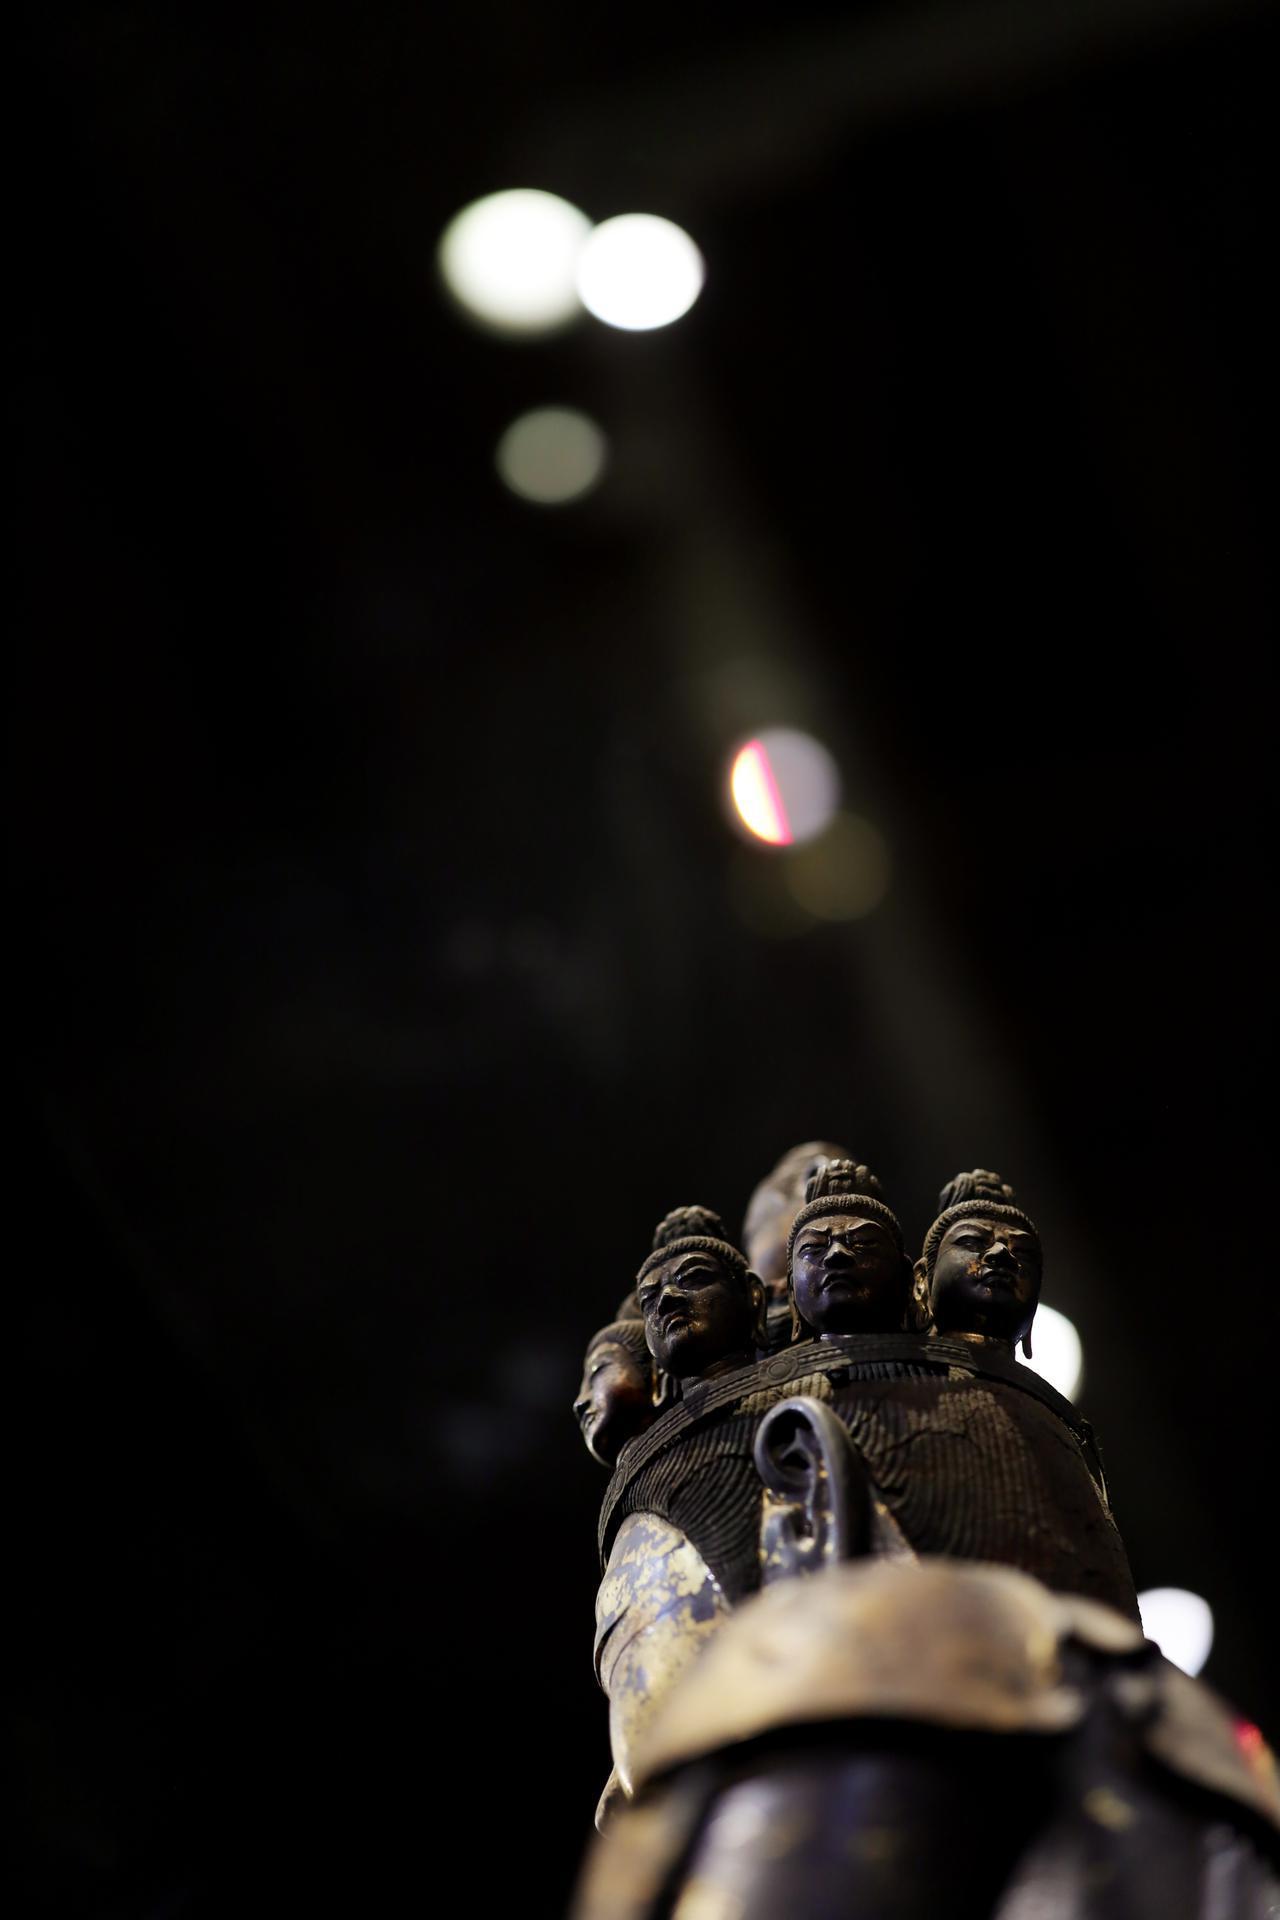 画像: 国宝 十一面観音菩薩立像 (部分・緻密に造形された頭部と頭上面) 奈良時代・8世紀 奈良・聖林寺蔵